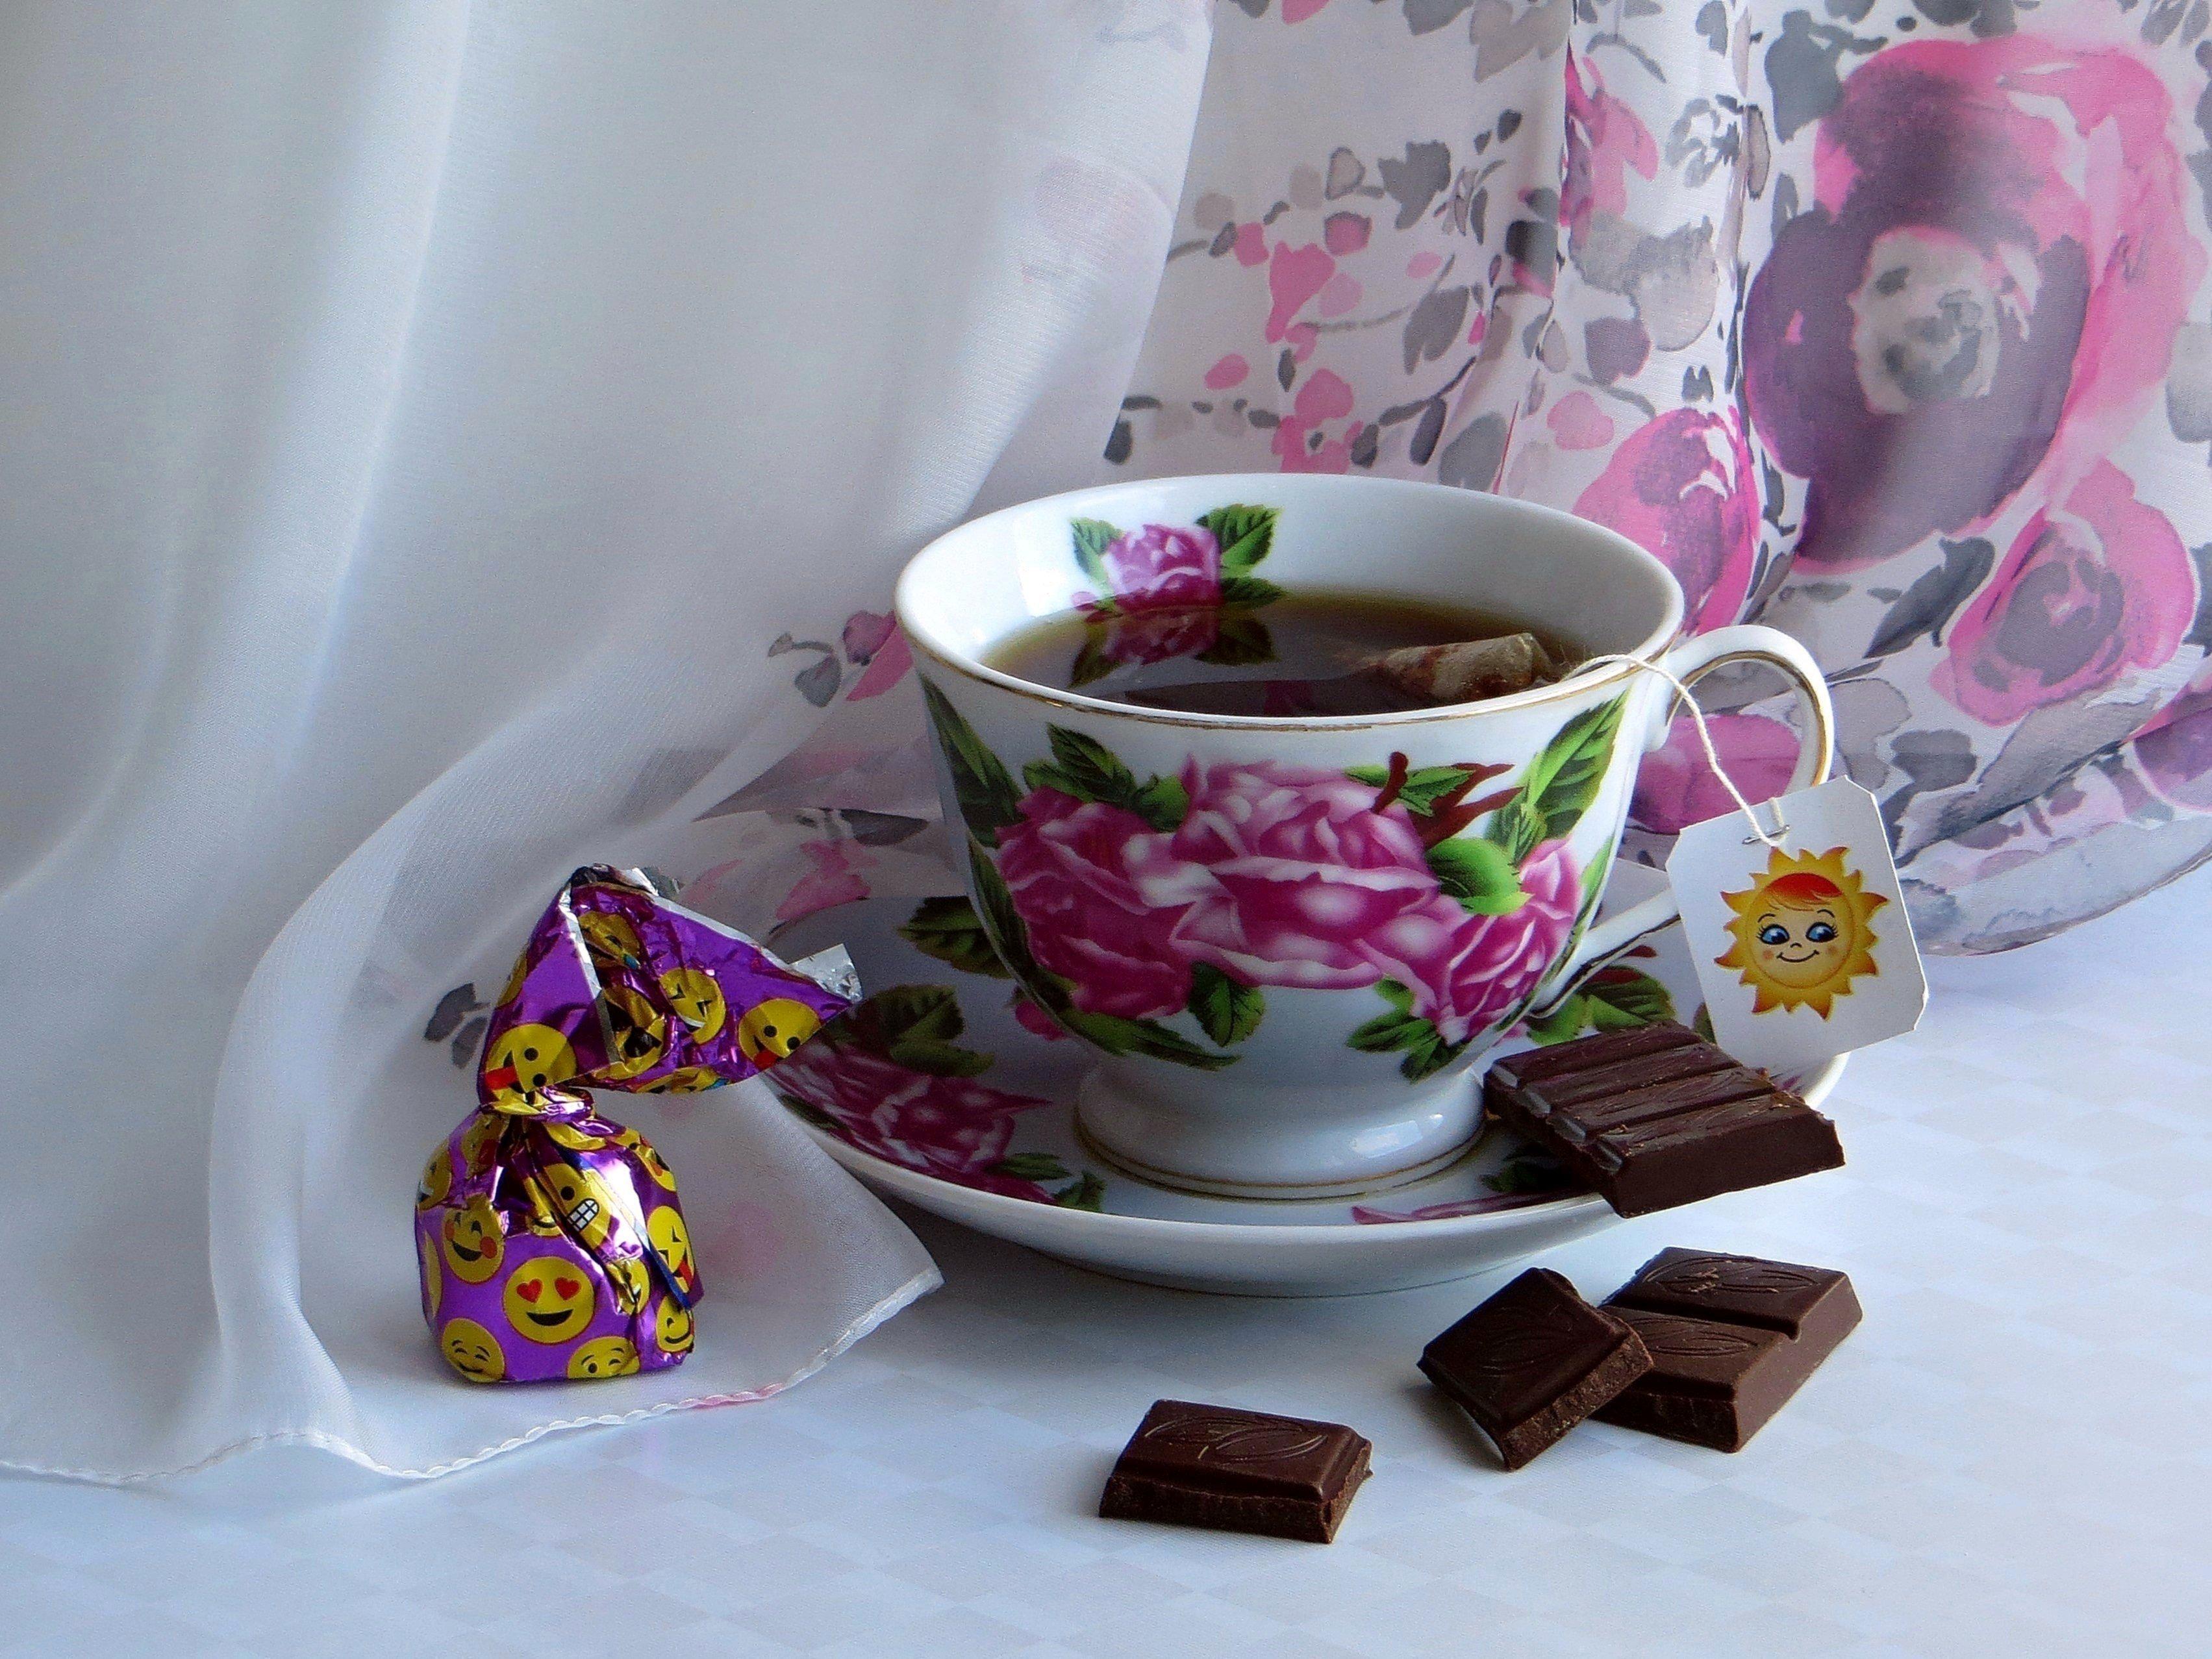 Картинки чай с конфетками